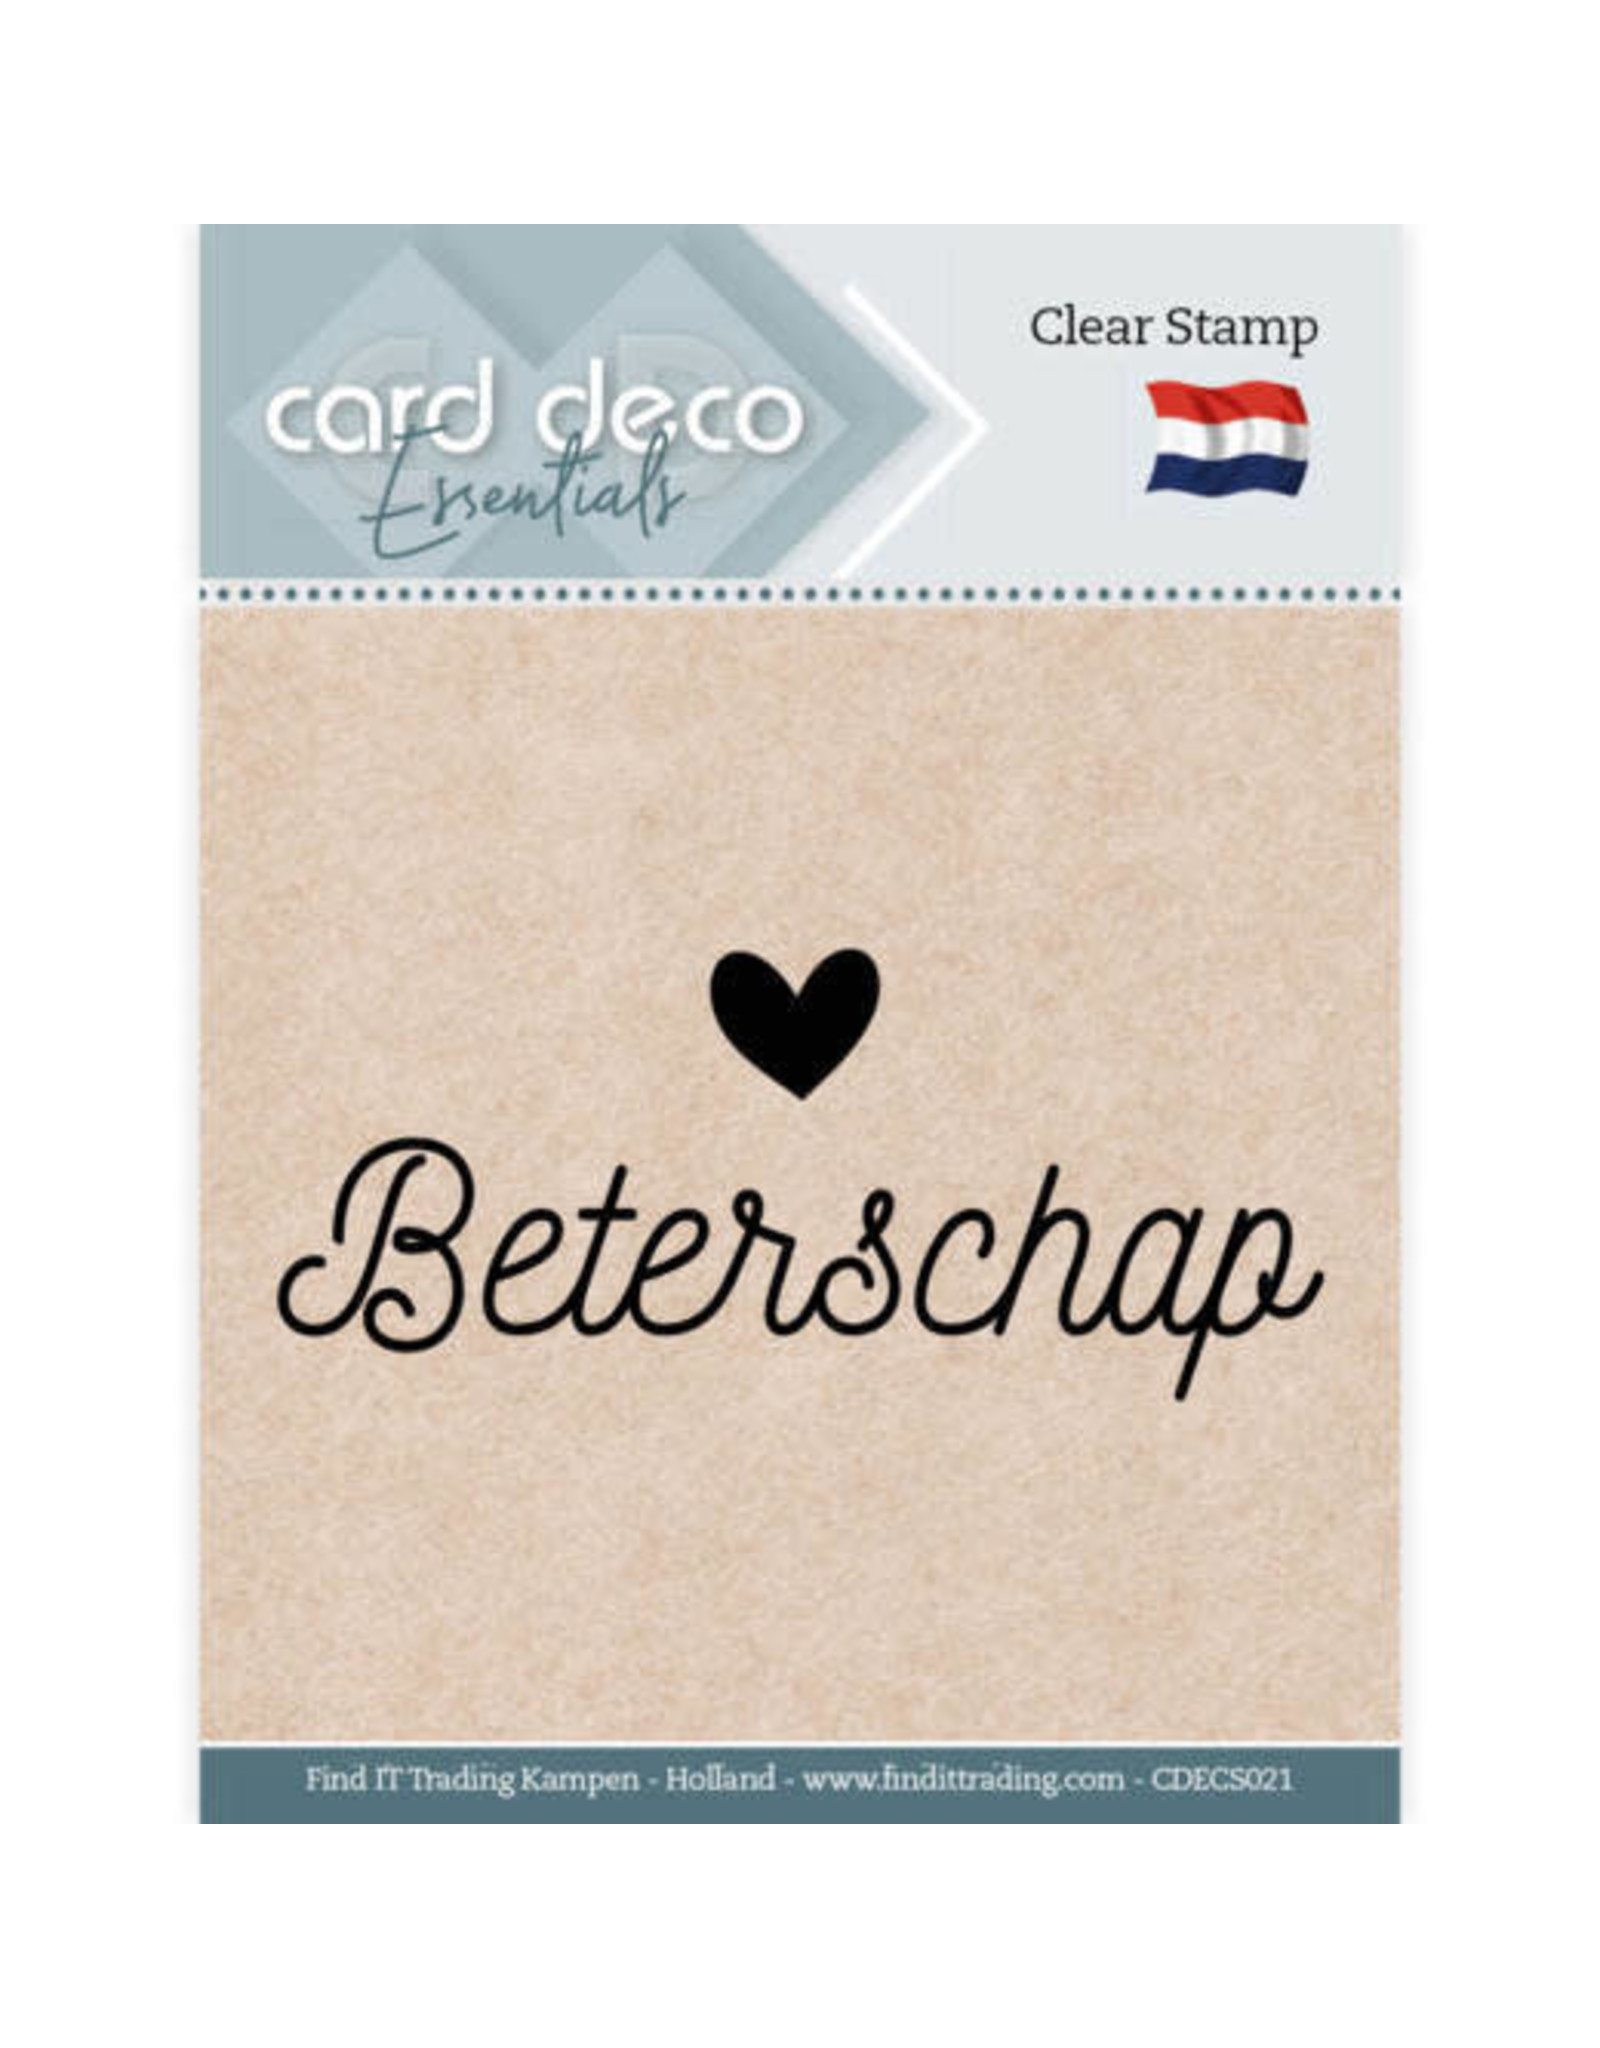 Card Deco Card Deco Essentials - Clear Stamps - Beterschap